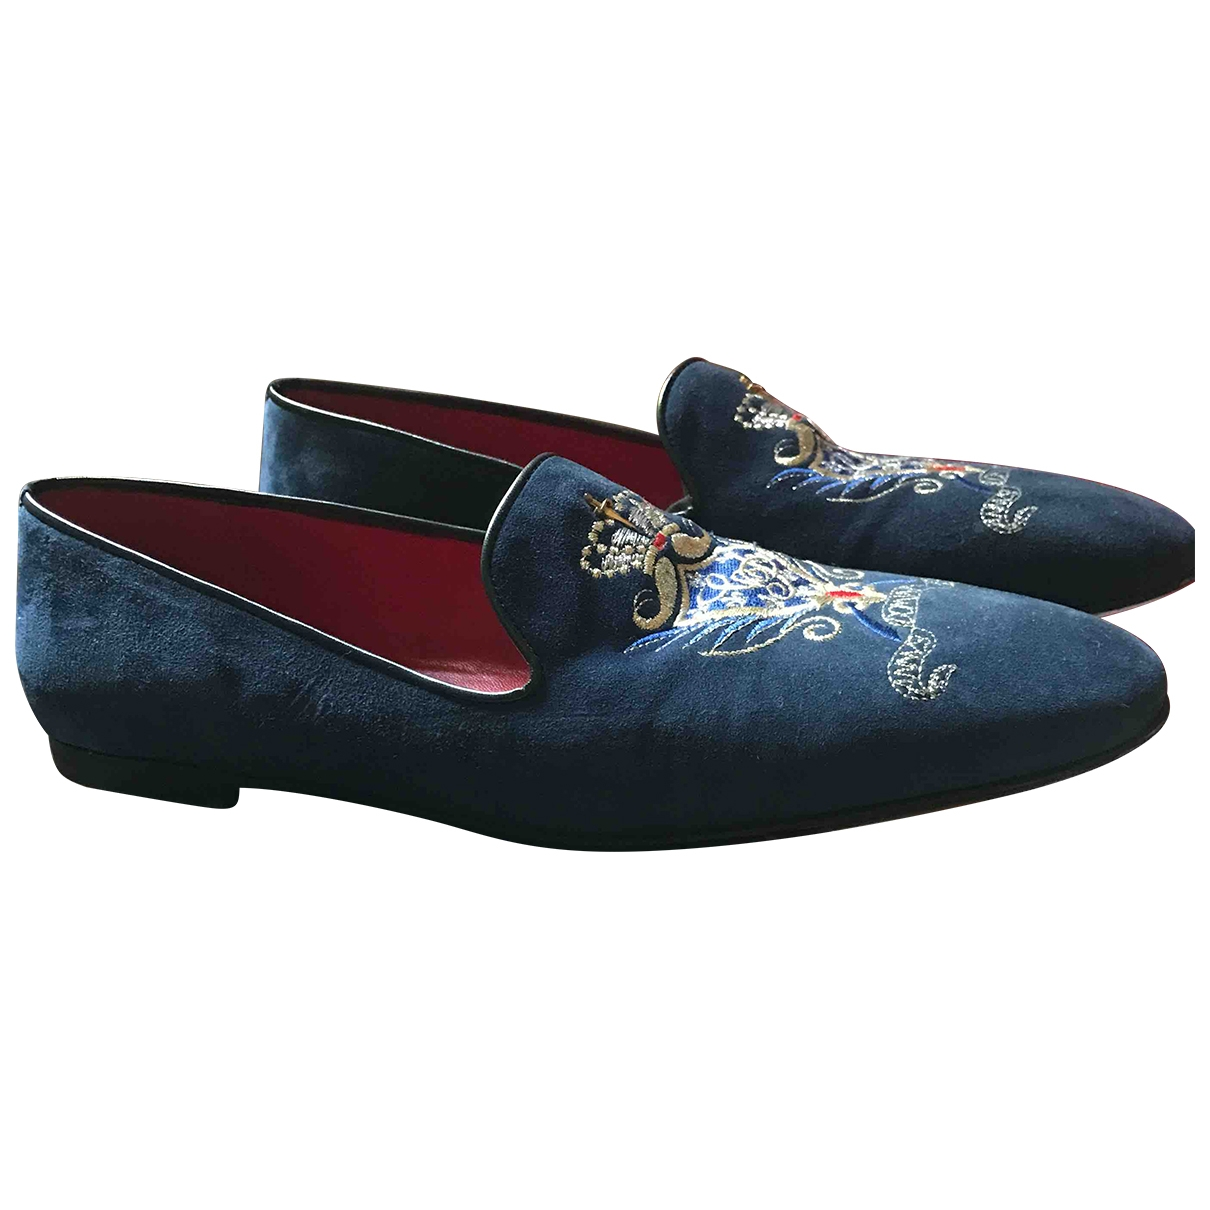 Cesare Paciotti \N Blue Suede Flats for Men 7.5 UK